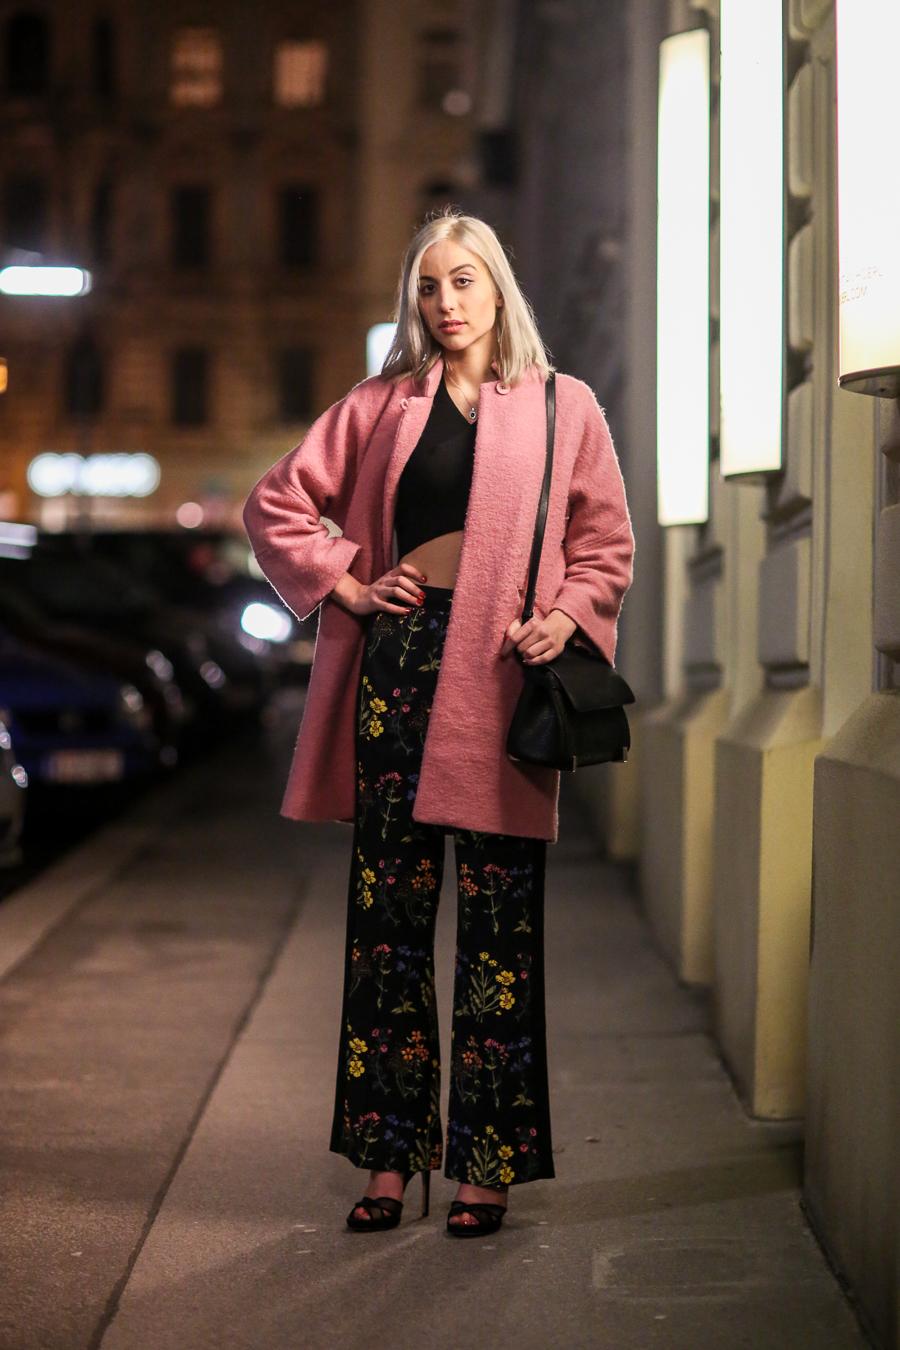 street-style-fashion-blog-vienna-selina